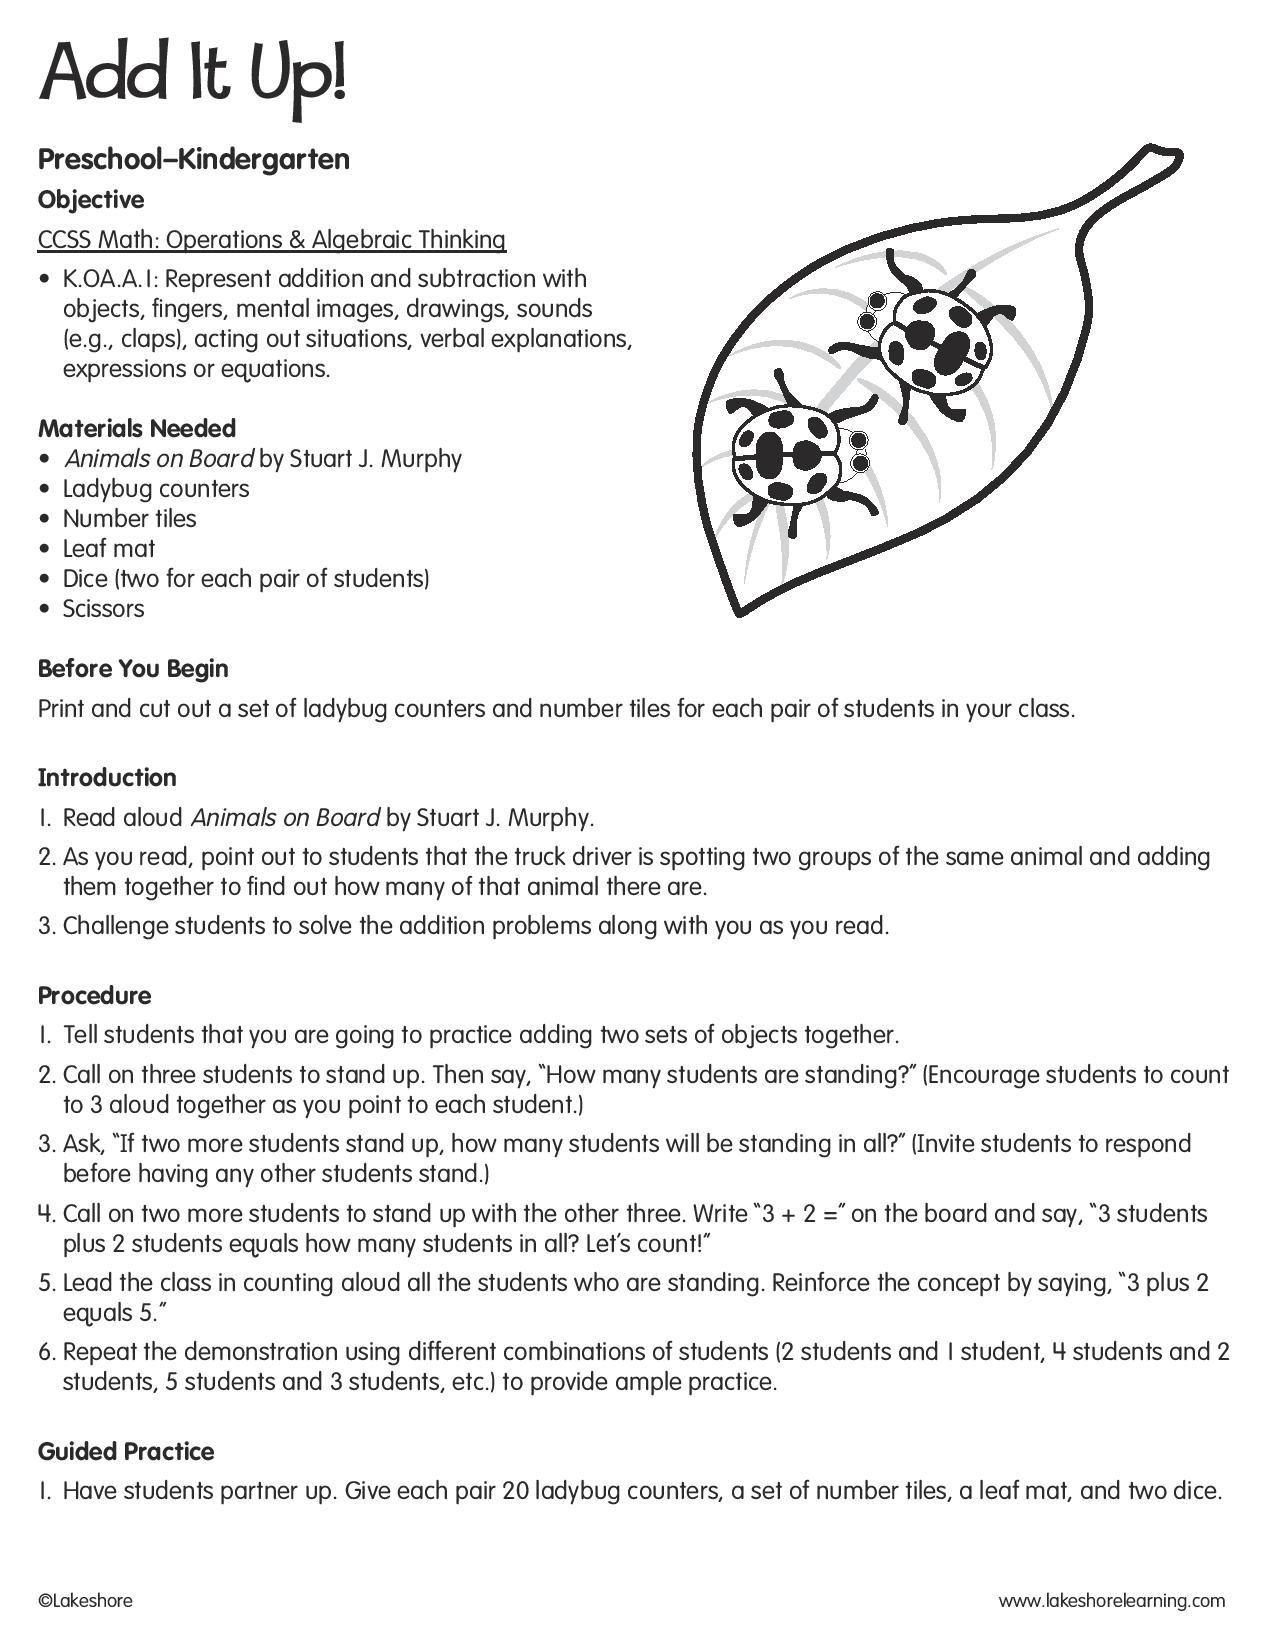 Ubd Lesson Plan Template Beautiful Gssd Ubd Template With Questions Mauri Remem Lesson Plan Templates Kindergarten Lesson Plans Template Printable Lesson Plans